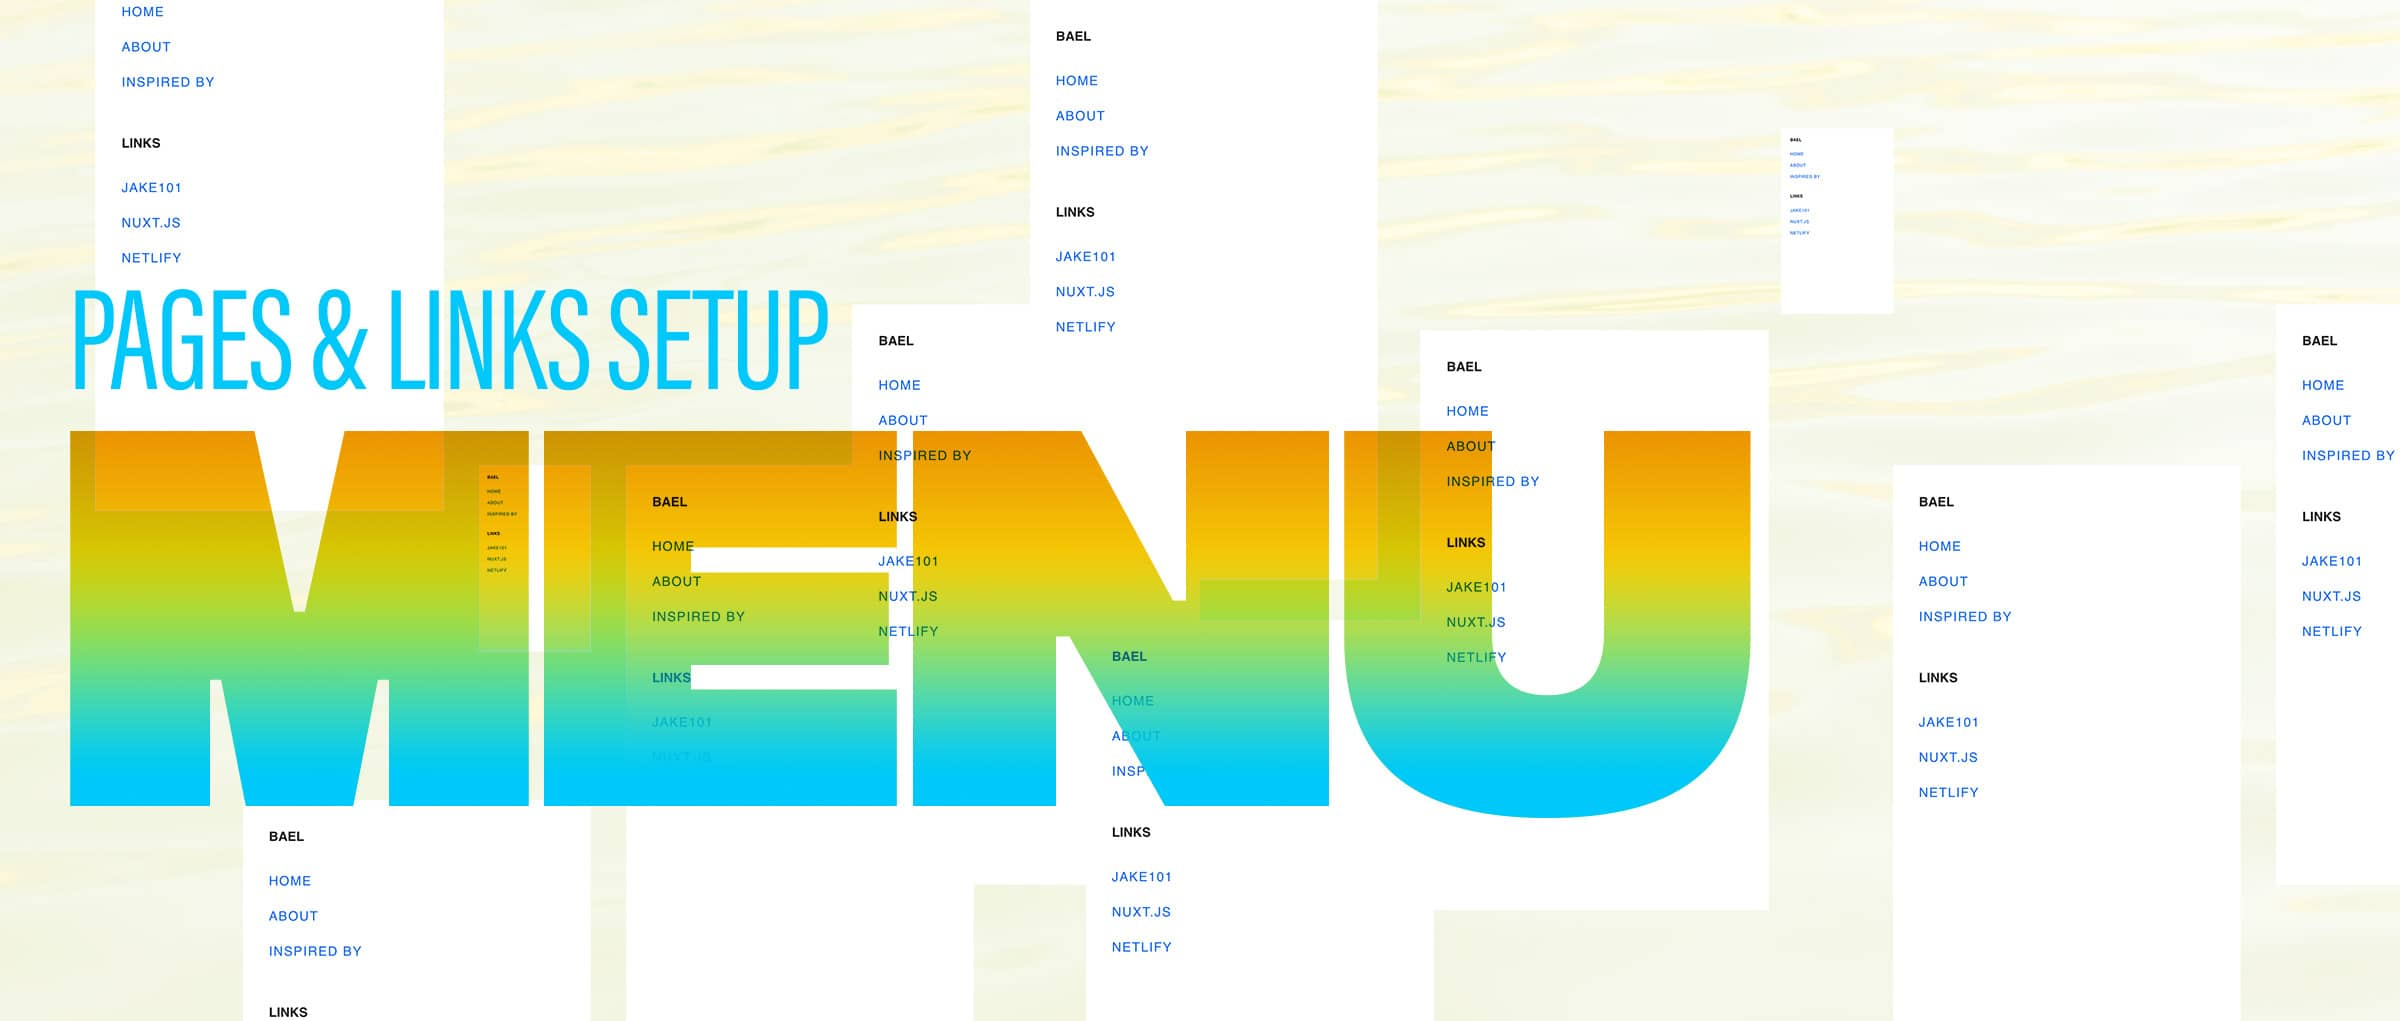 Menu Setup — Pages & Links